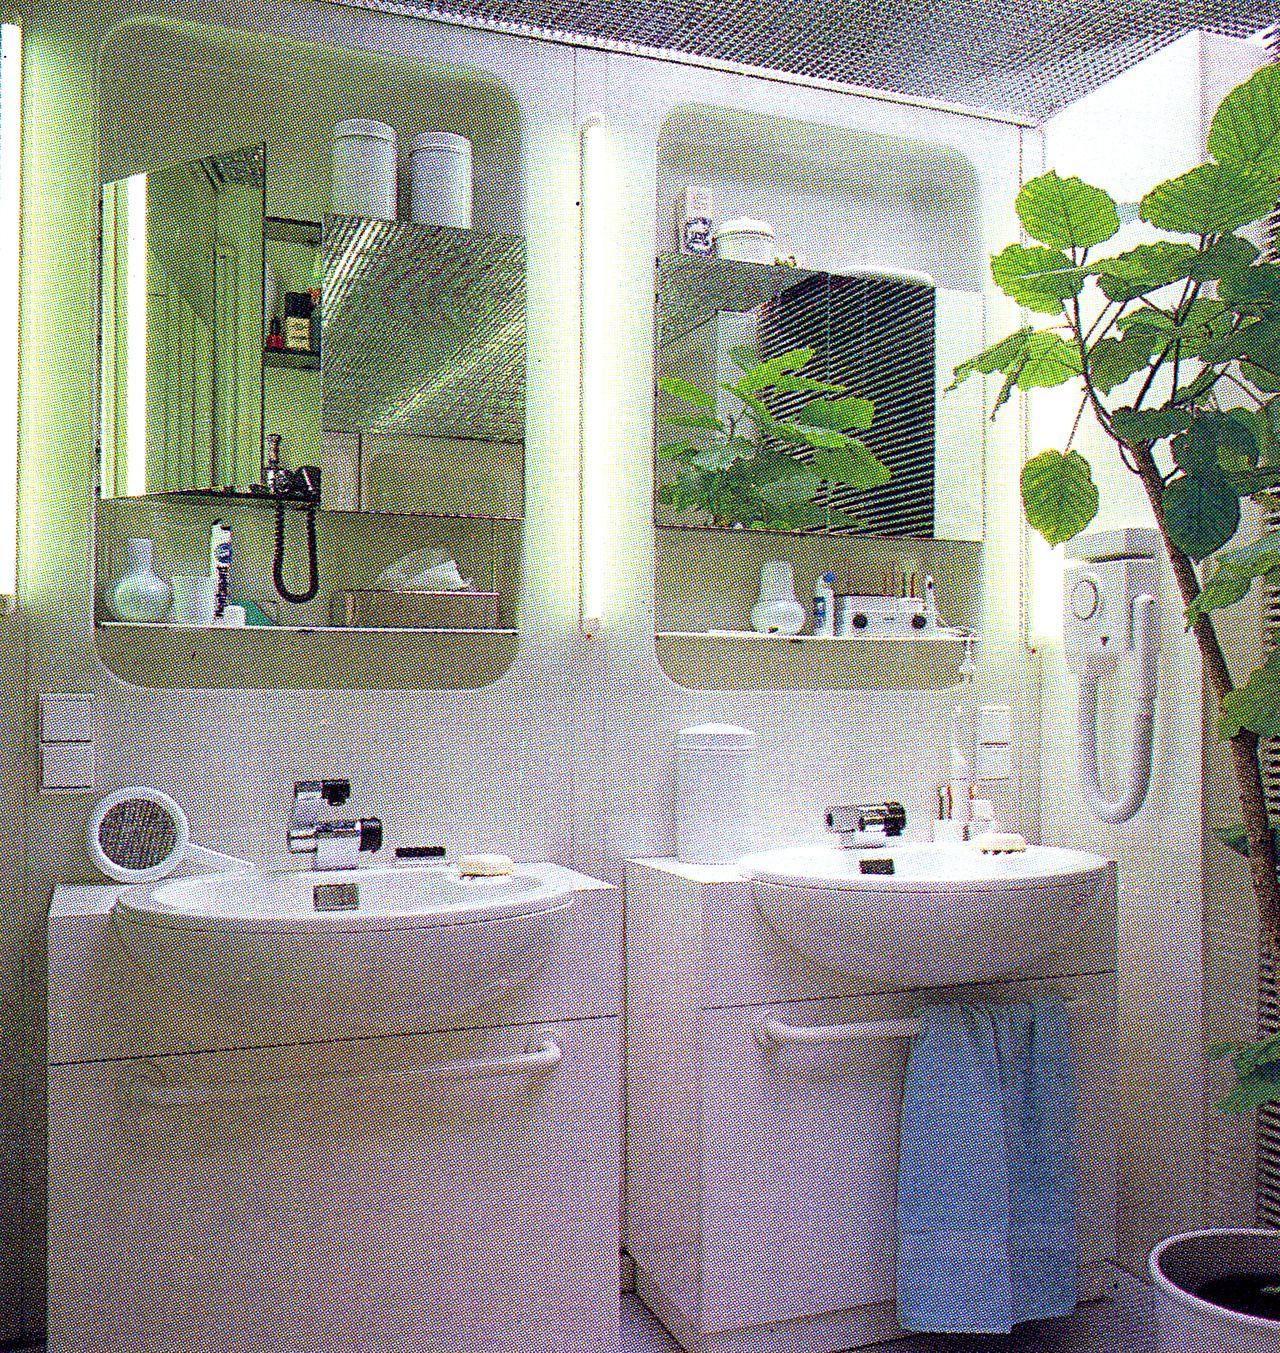 Aesthetic Houseplants House Interior Decor Plants Design